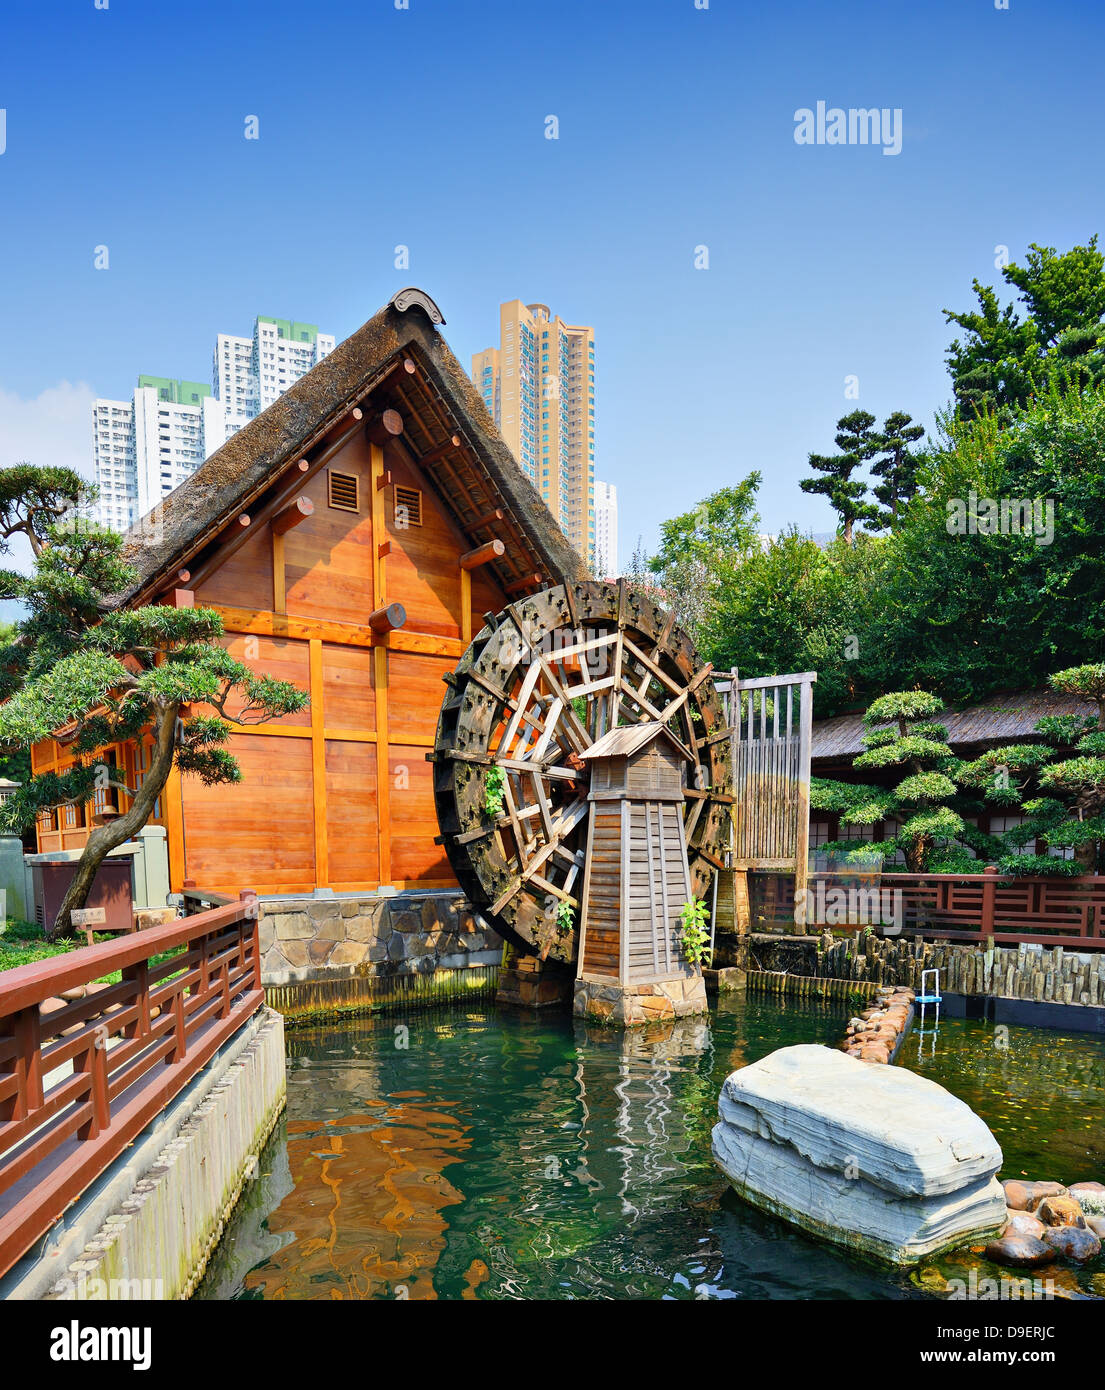 Waterwheel at Nanlian Garden in Diamond Hill District of Hong Kong, China. - Stock Image